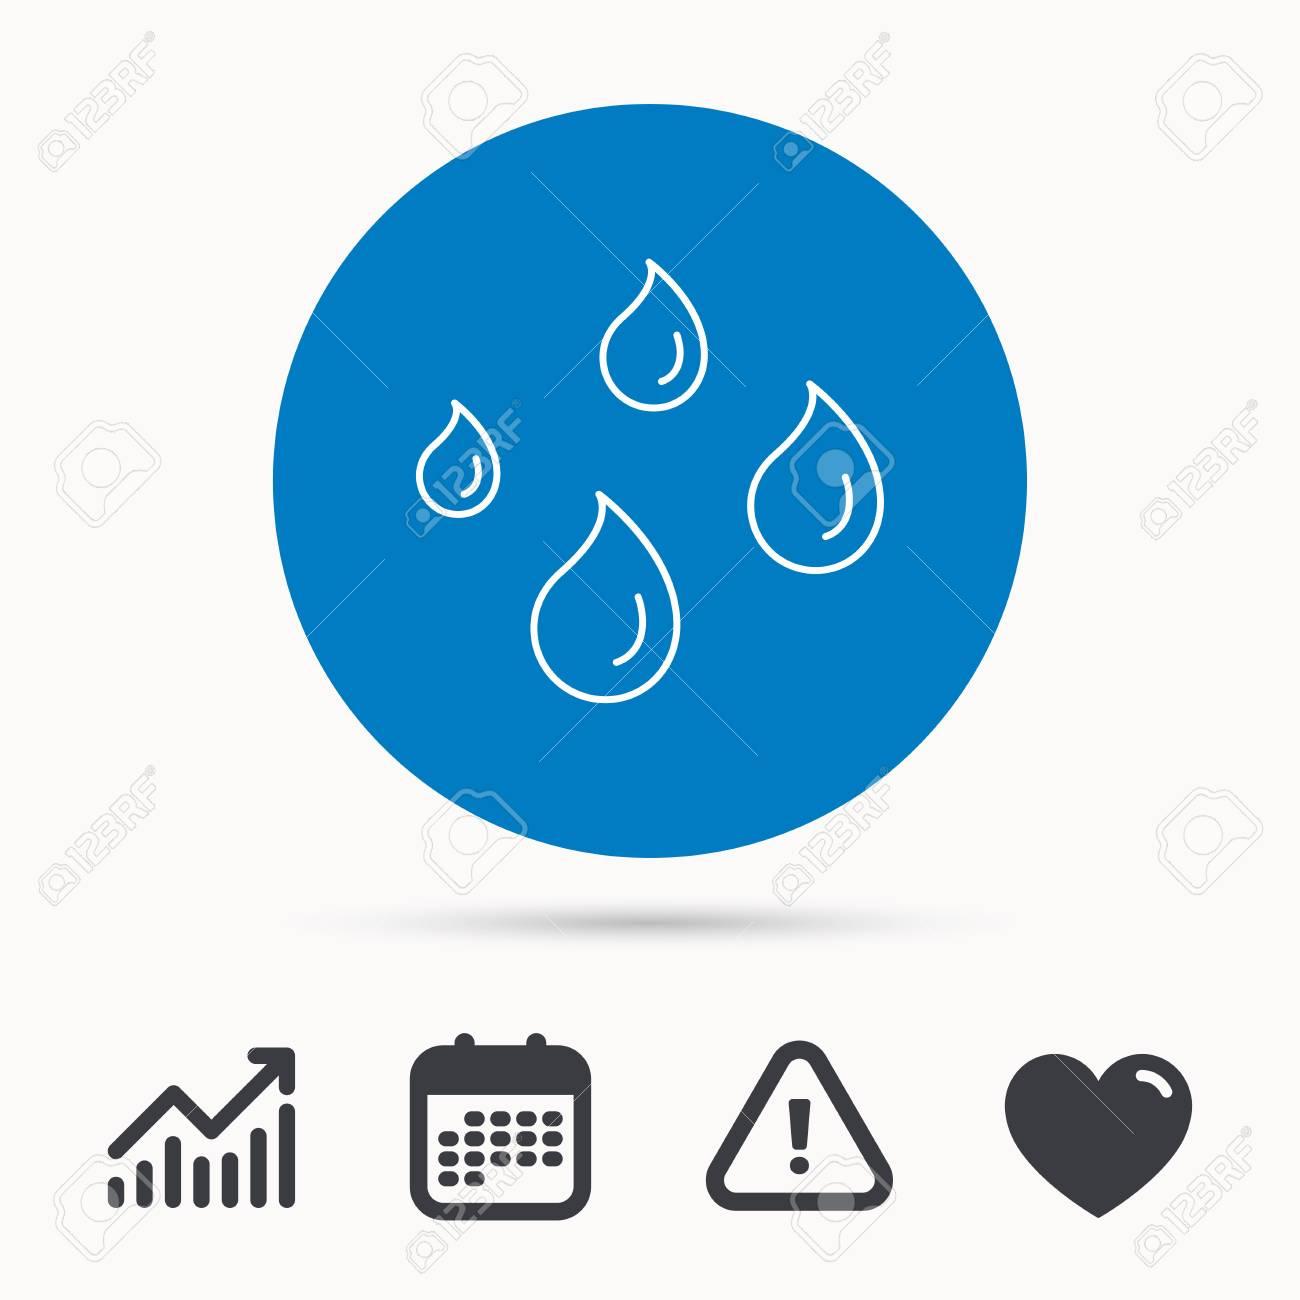 Water drops icon  Rain or washing sign  Rainy day symbol  Calendar,